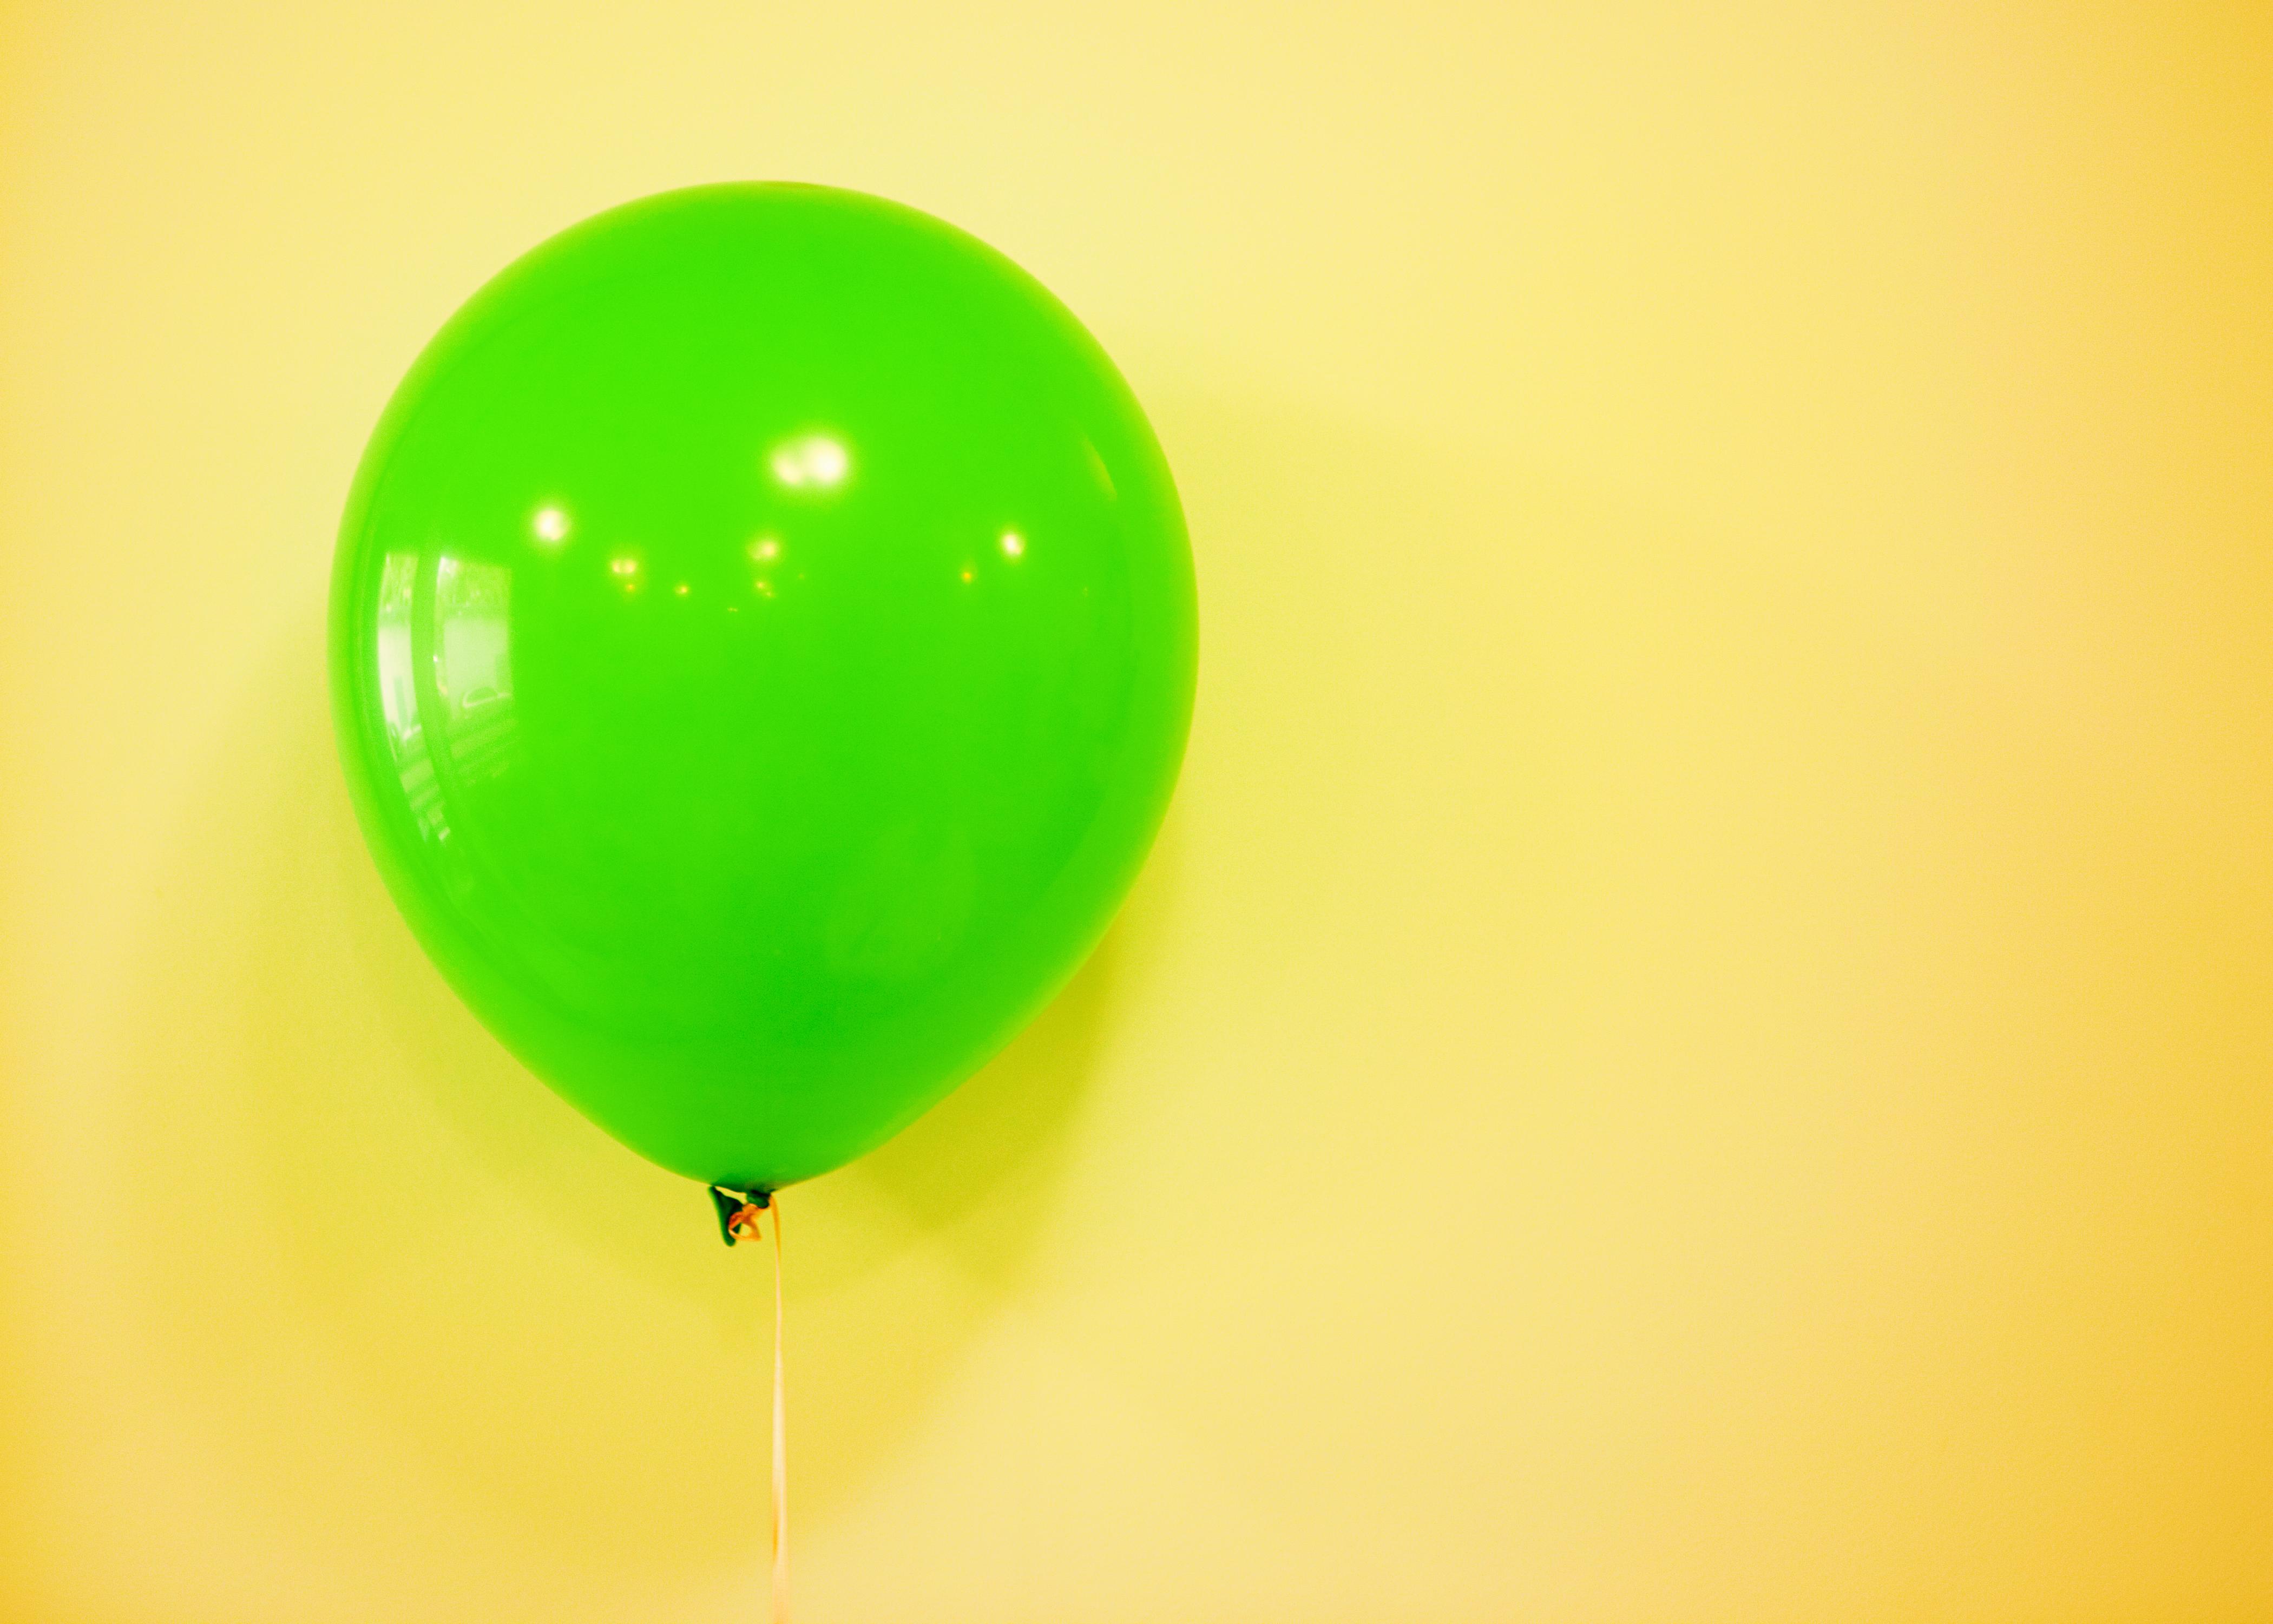 Green balloon photo